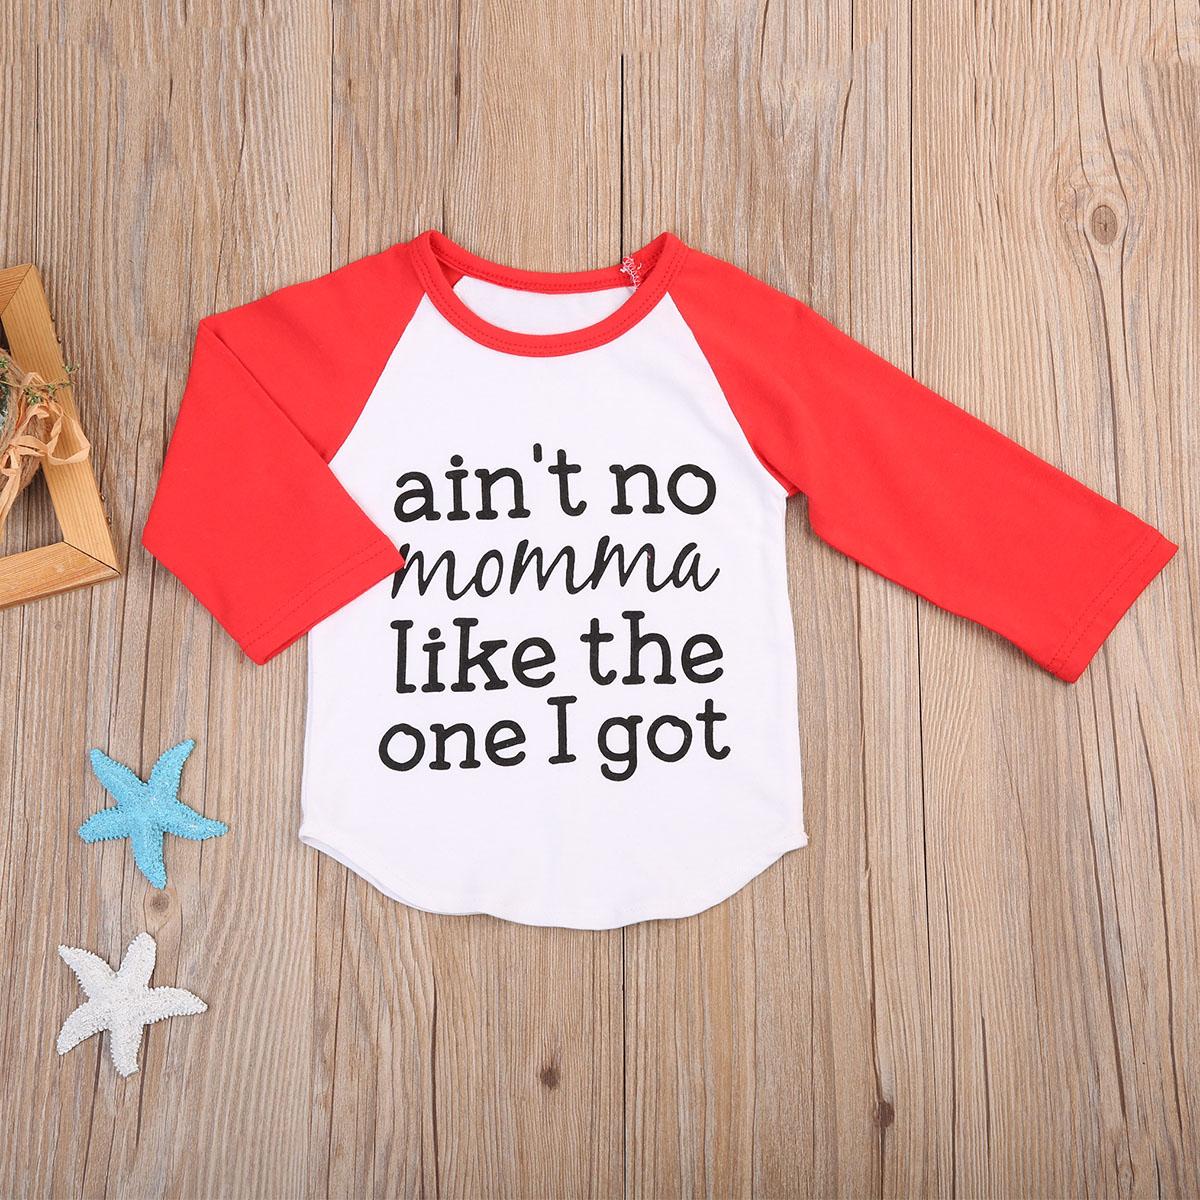 2017 Nieuwe Aankomst Pasgeboren Infant Kids Baby Jongen Katoen Lange Mouw Outfits Kleding T-shirt Tops Letters Ik Kreeg Kleding 0-24 M